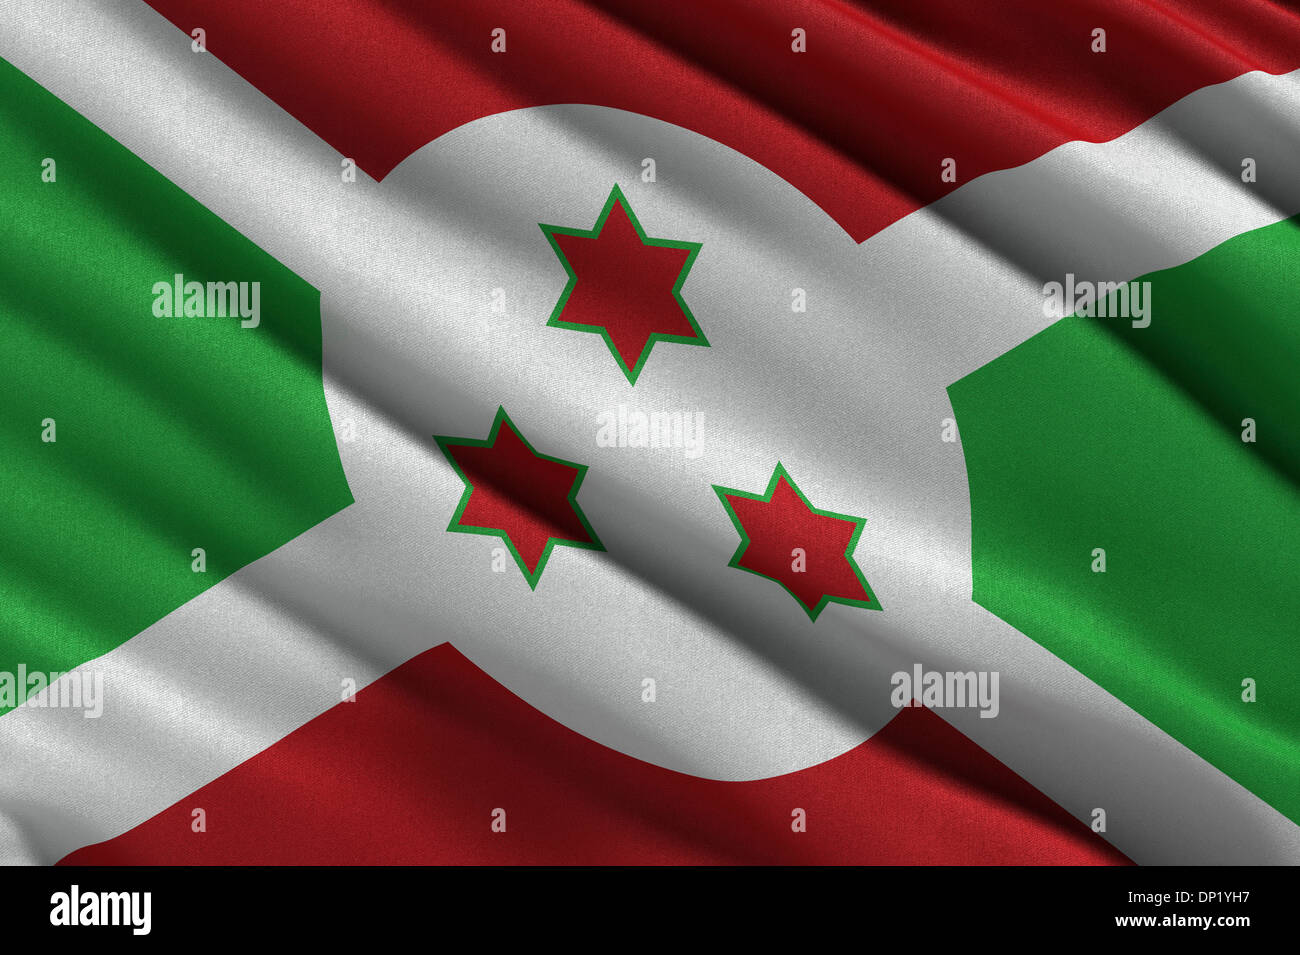 Flag of Burundi waving in the wind - Stock Image